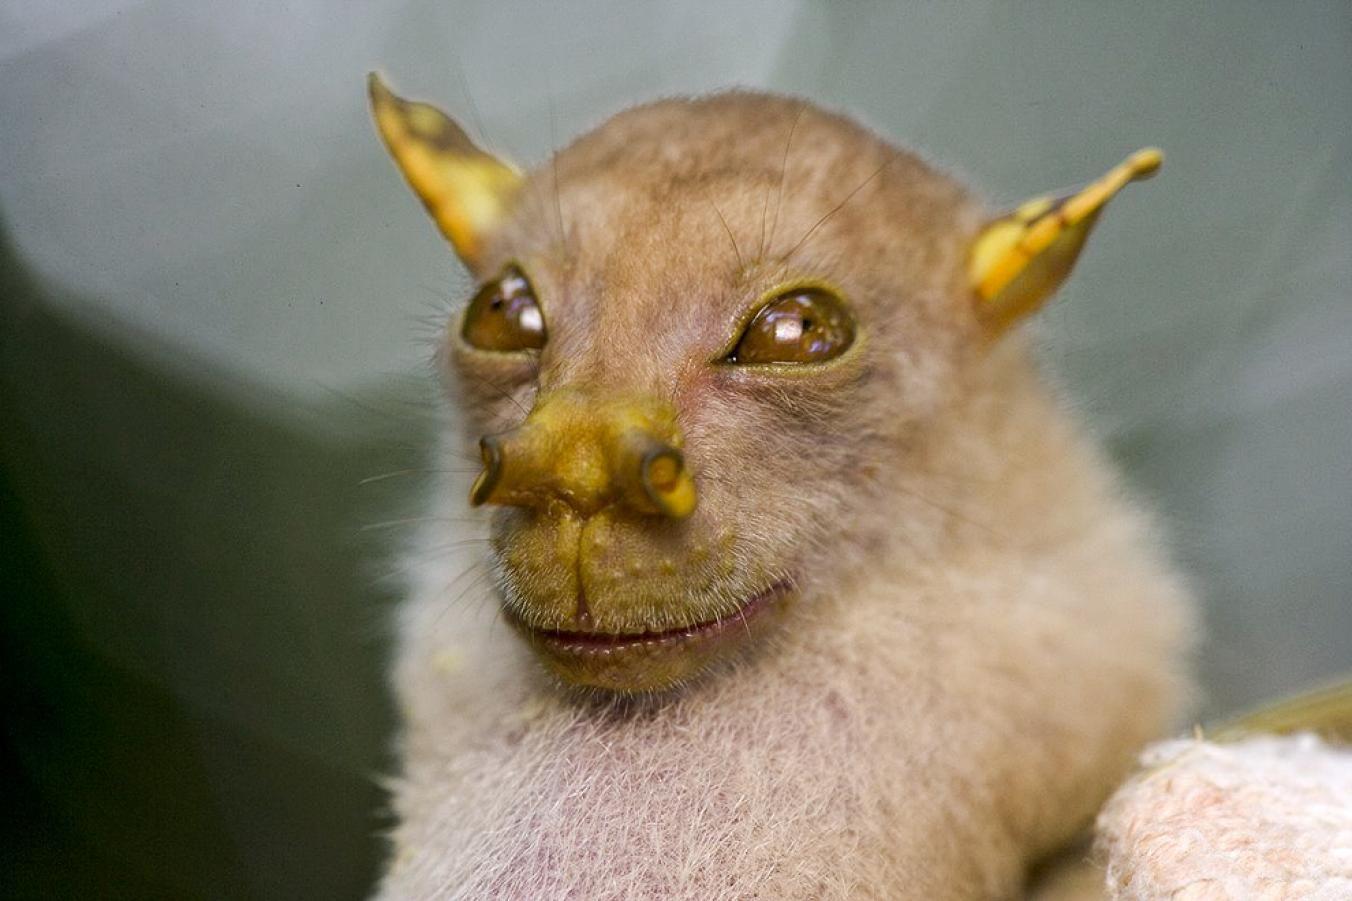 Ten Weirdest New Animals of 2010: Editors' Picks | Scary animals, Unusual  animals, Rare animals